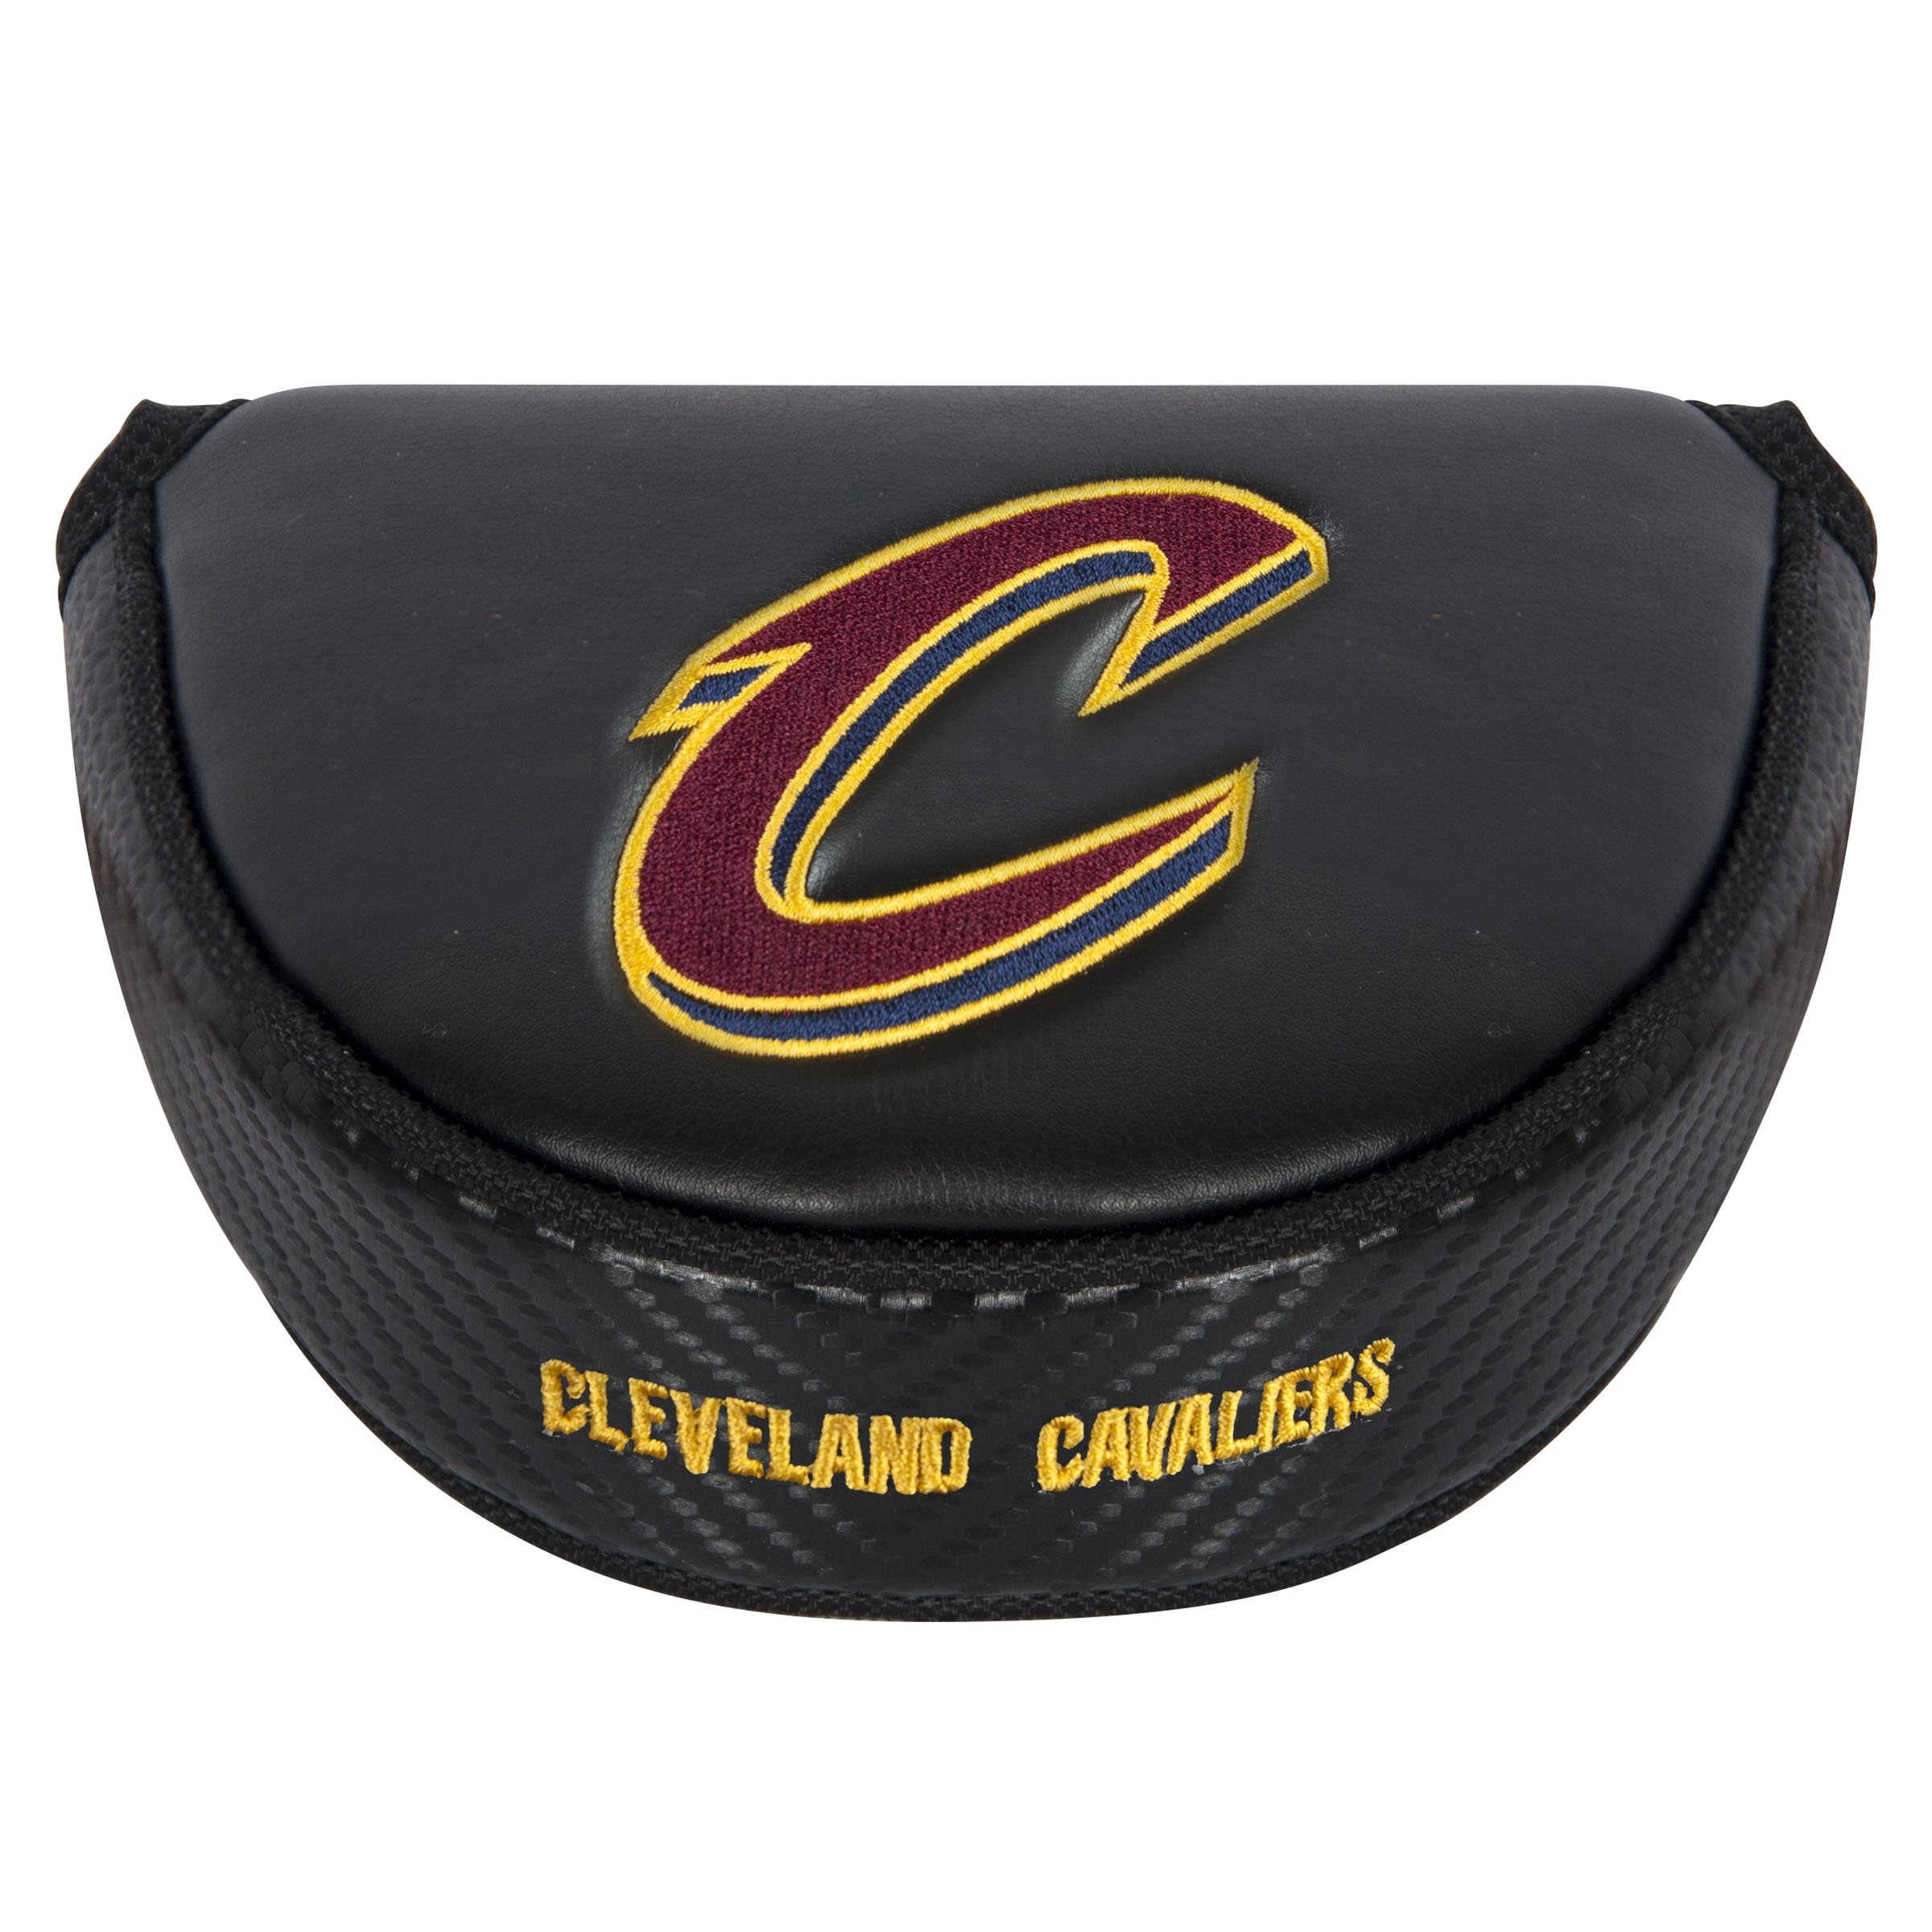 Team Effort NBA Cleveland Cavaliers black Mallet Putter Coverblack Mallet Putter Cover, NA